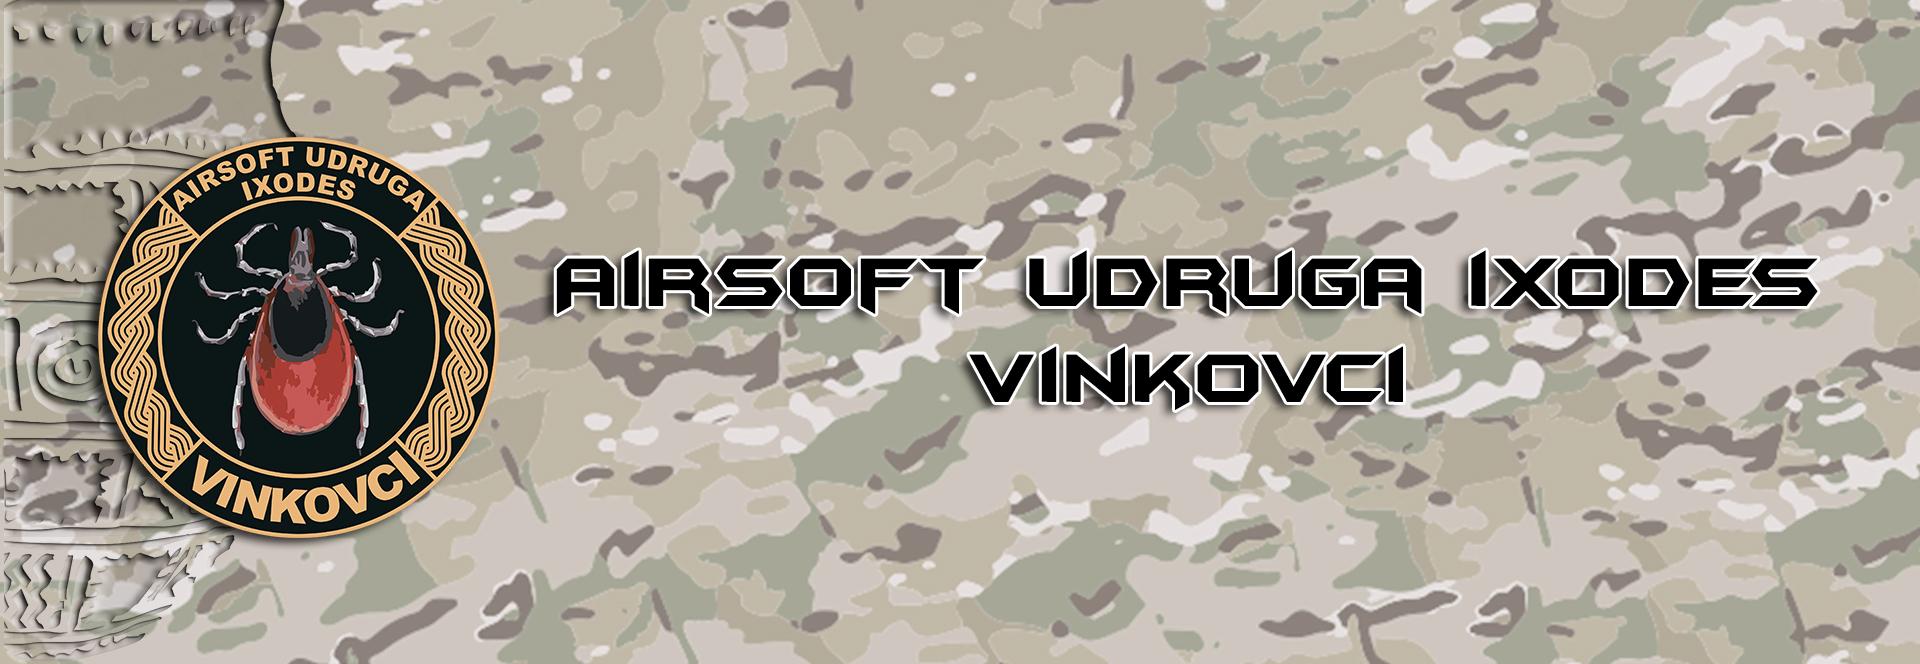 Airsoft udruga Krpelji Vinkovci